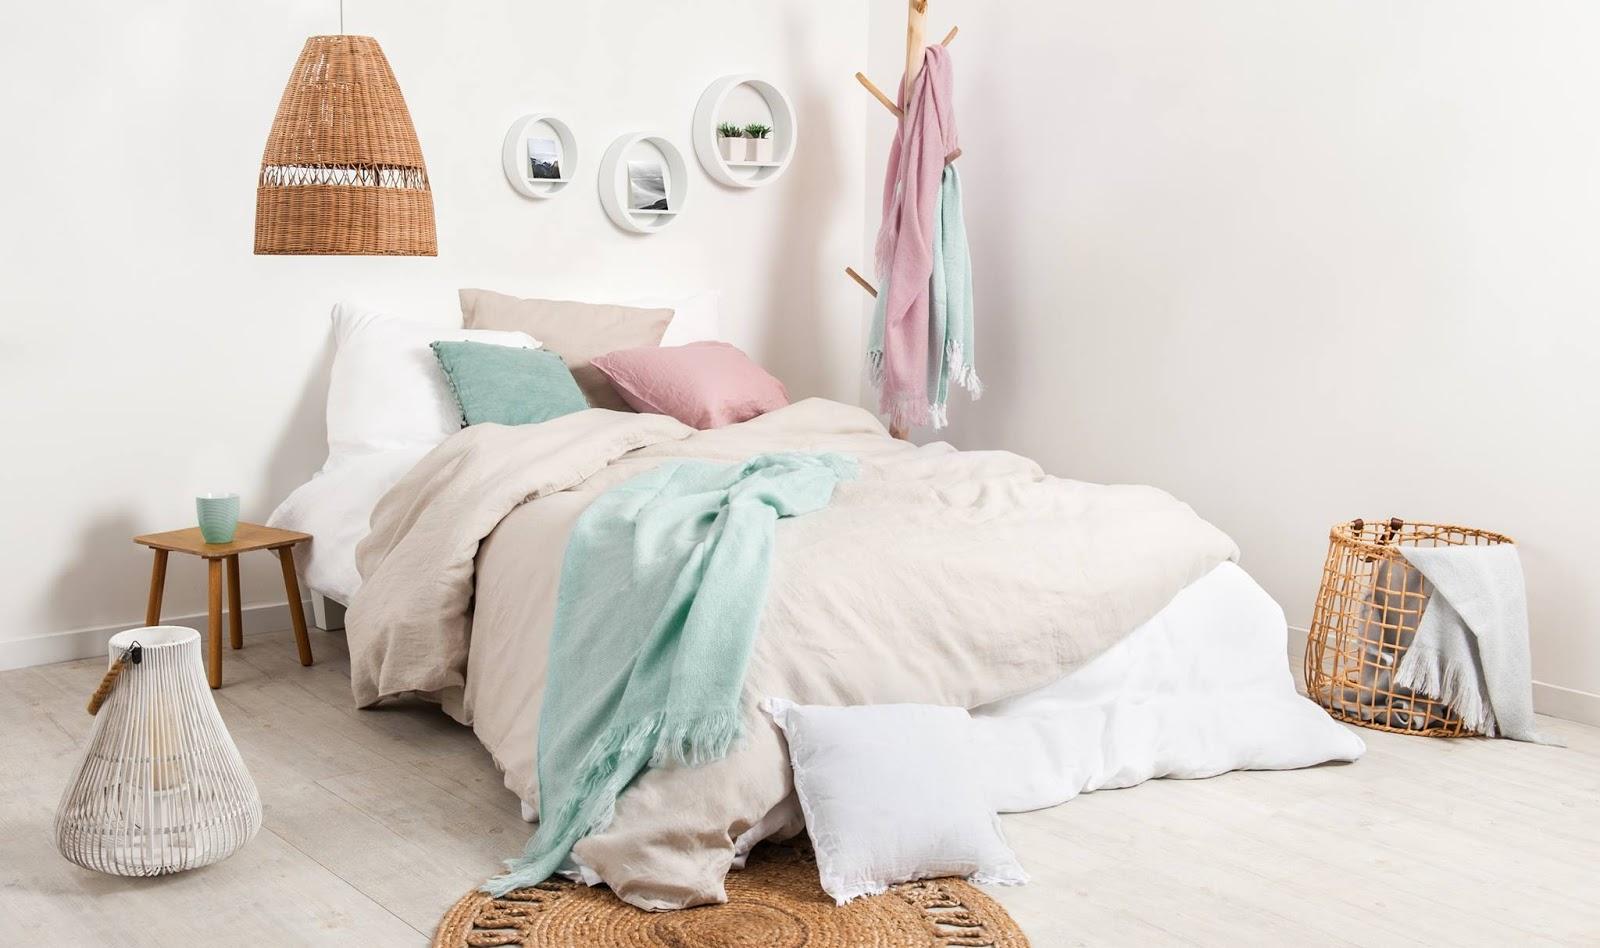 eminza s lection d co petit prix jessica beauty blogger lifestyle. Black Bedroom Furniture Sets. Home Design Ideas